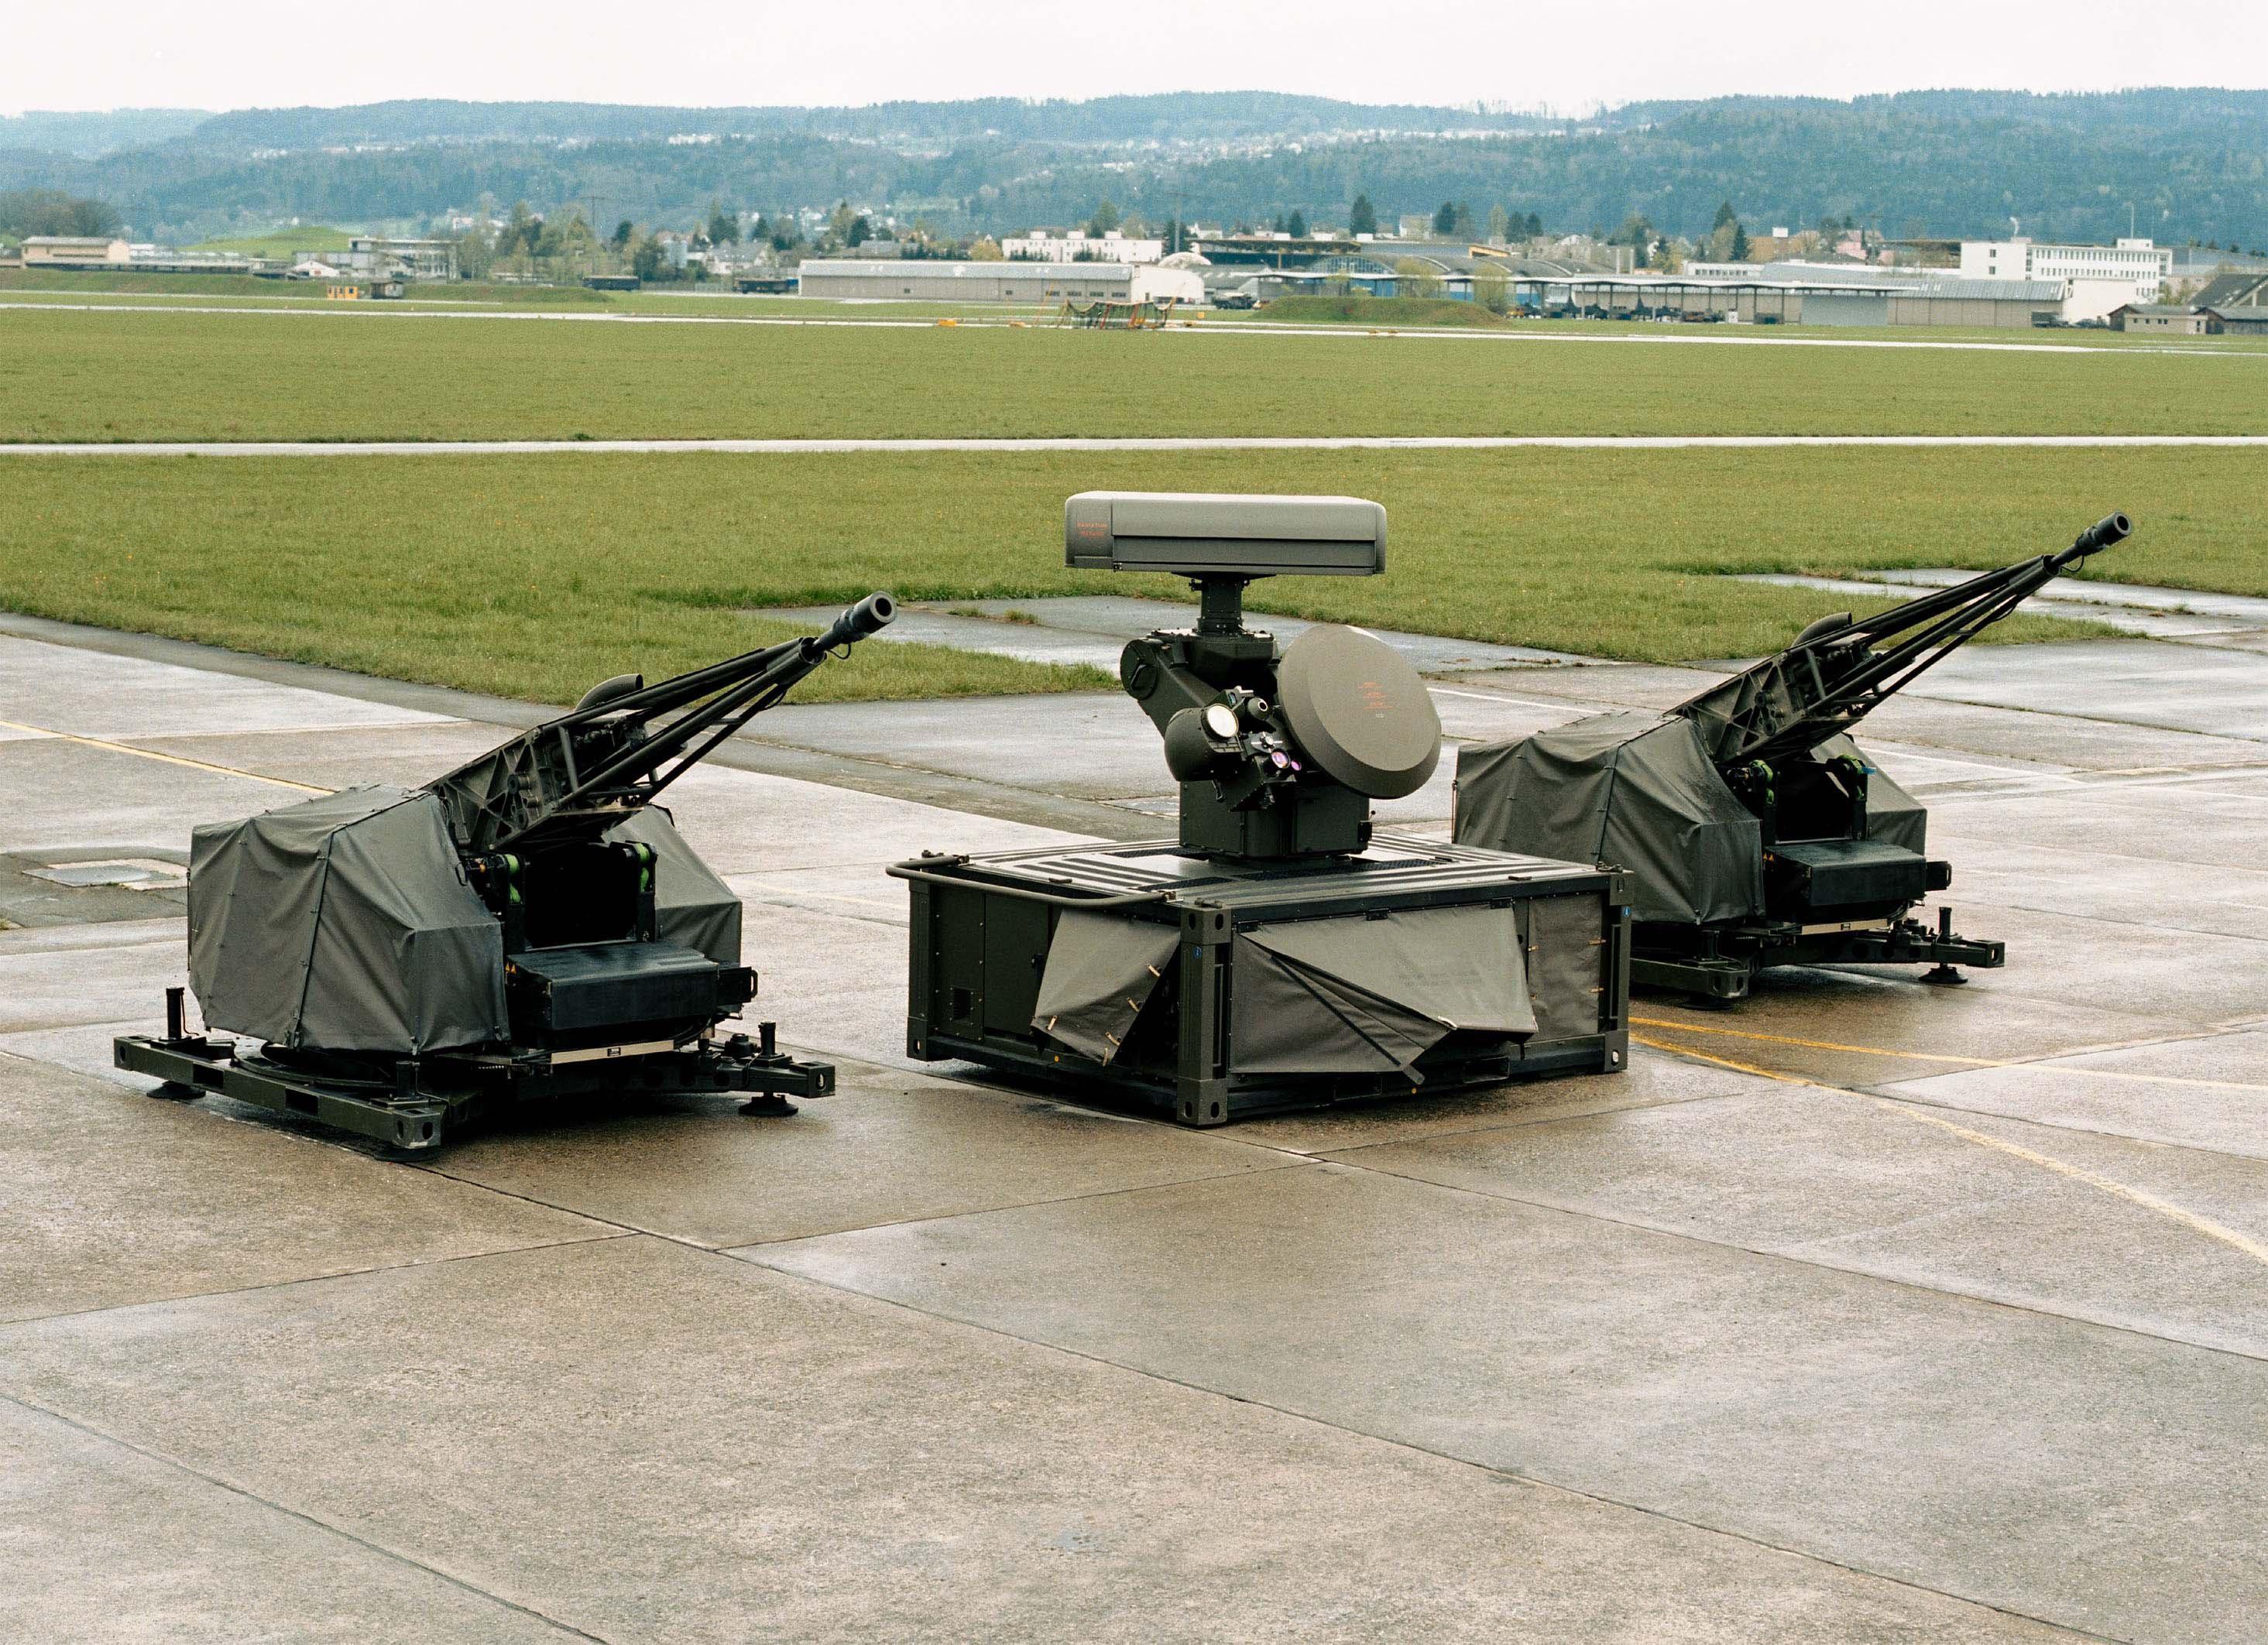 teknologi,meriam kembar,perisai udara